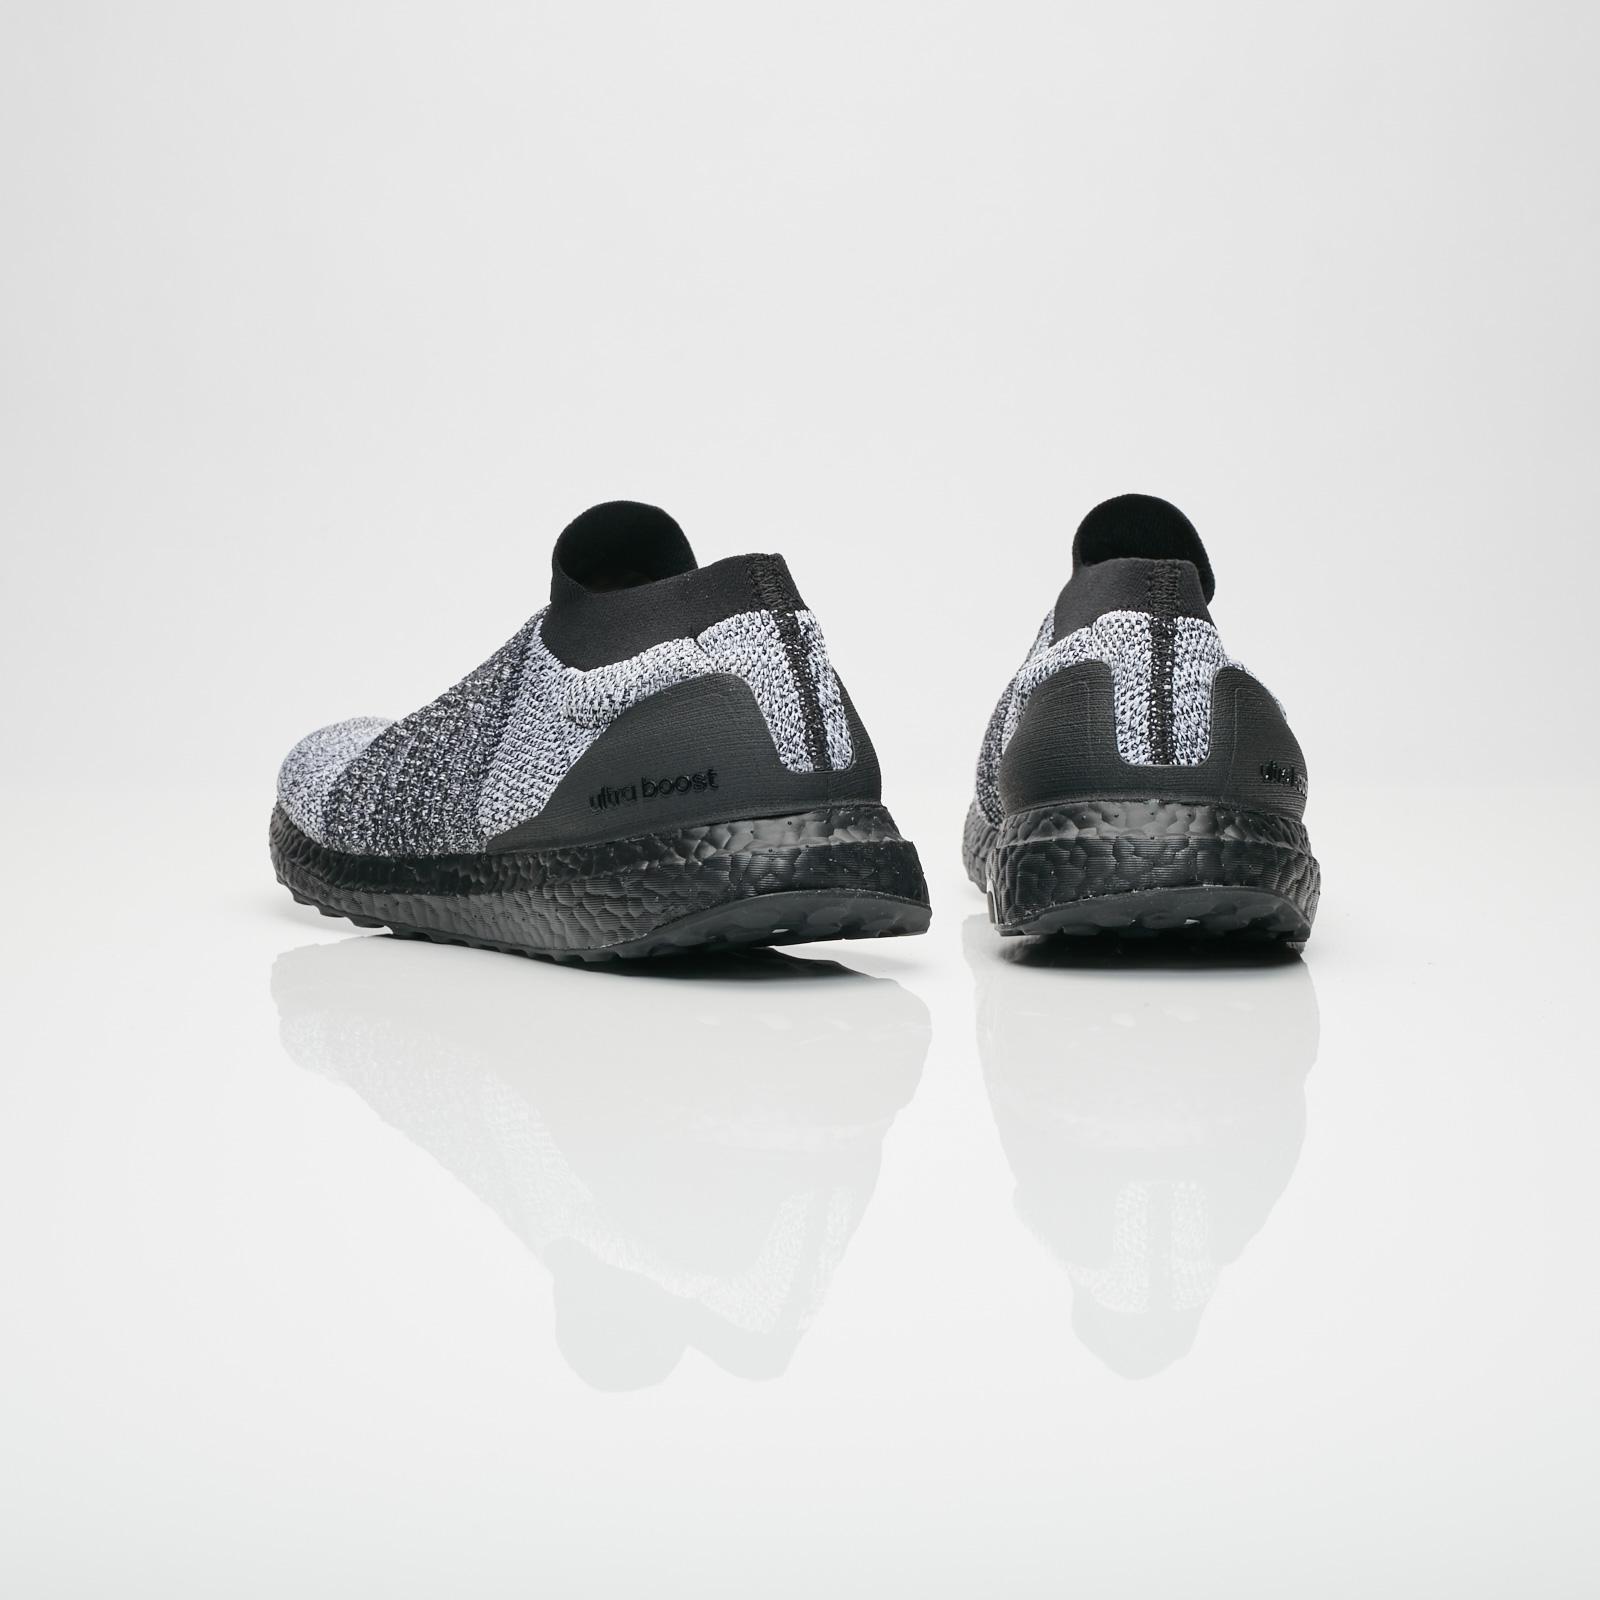 6a1bc7f52 adidas UltraBOOST Laceless - Bb6137 - Sneakersnstuff | sneakers &  streetwear online since 1999